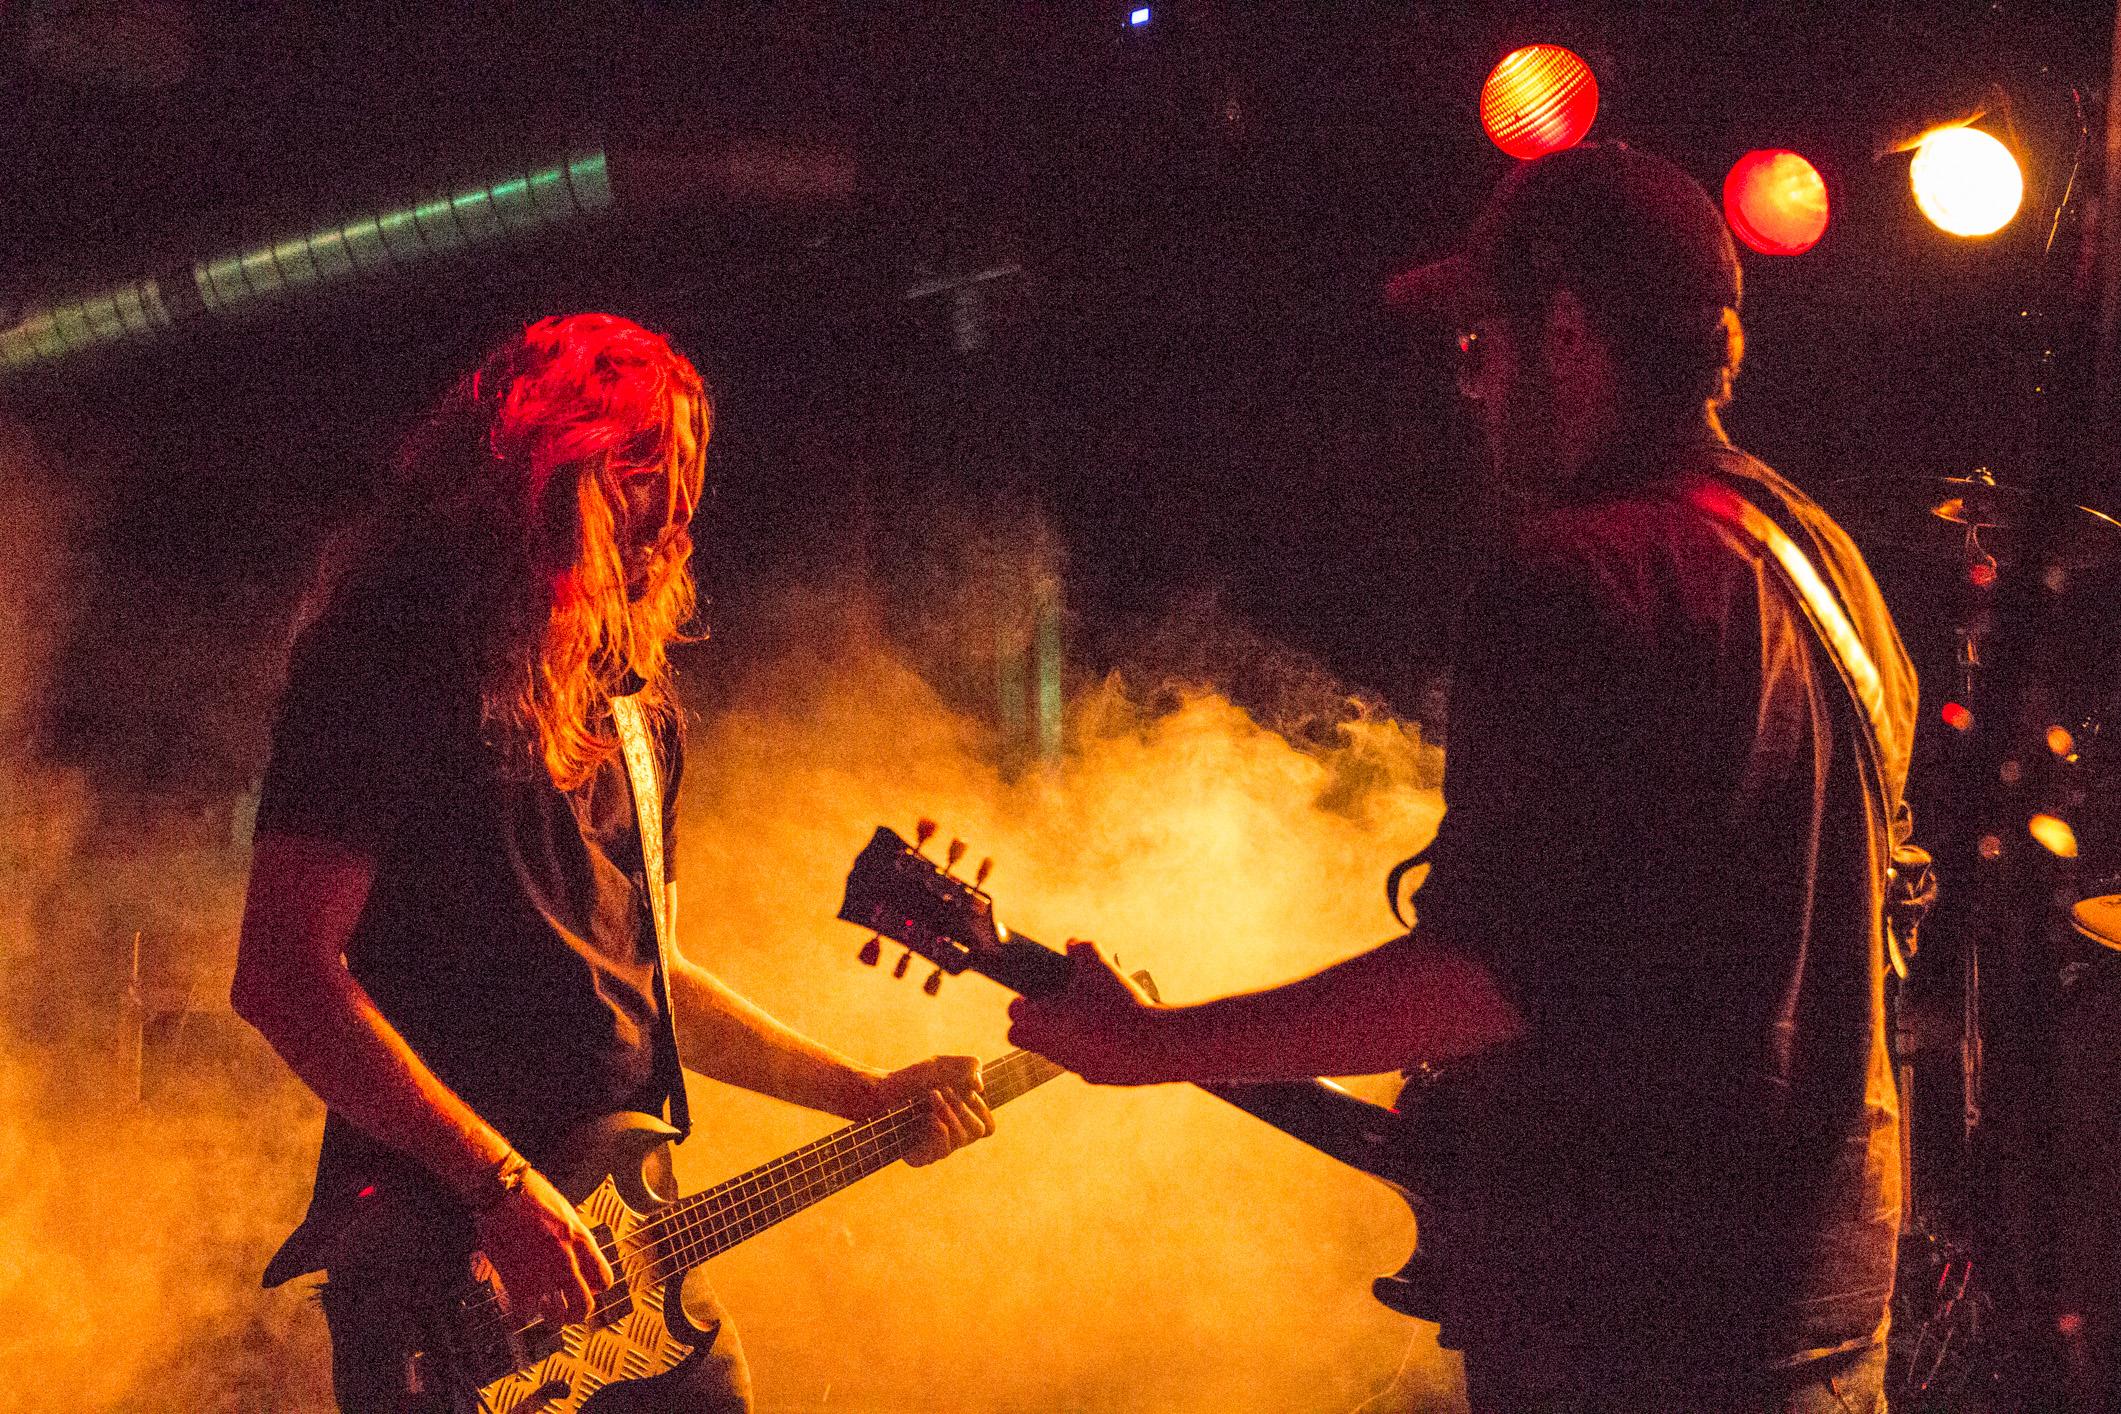 Mudcats (rock'n'roll, genève) en concert à l'Undertown de Meyrin, 19 septembre 2015